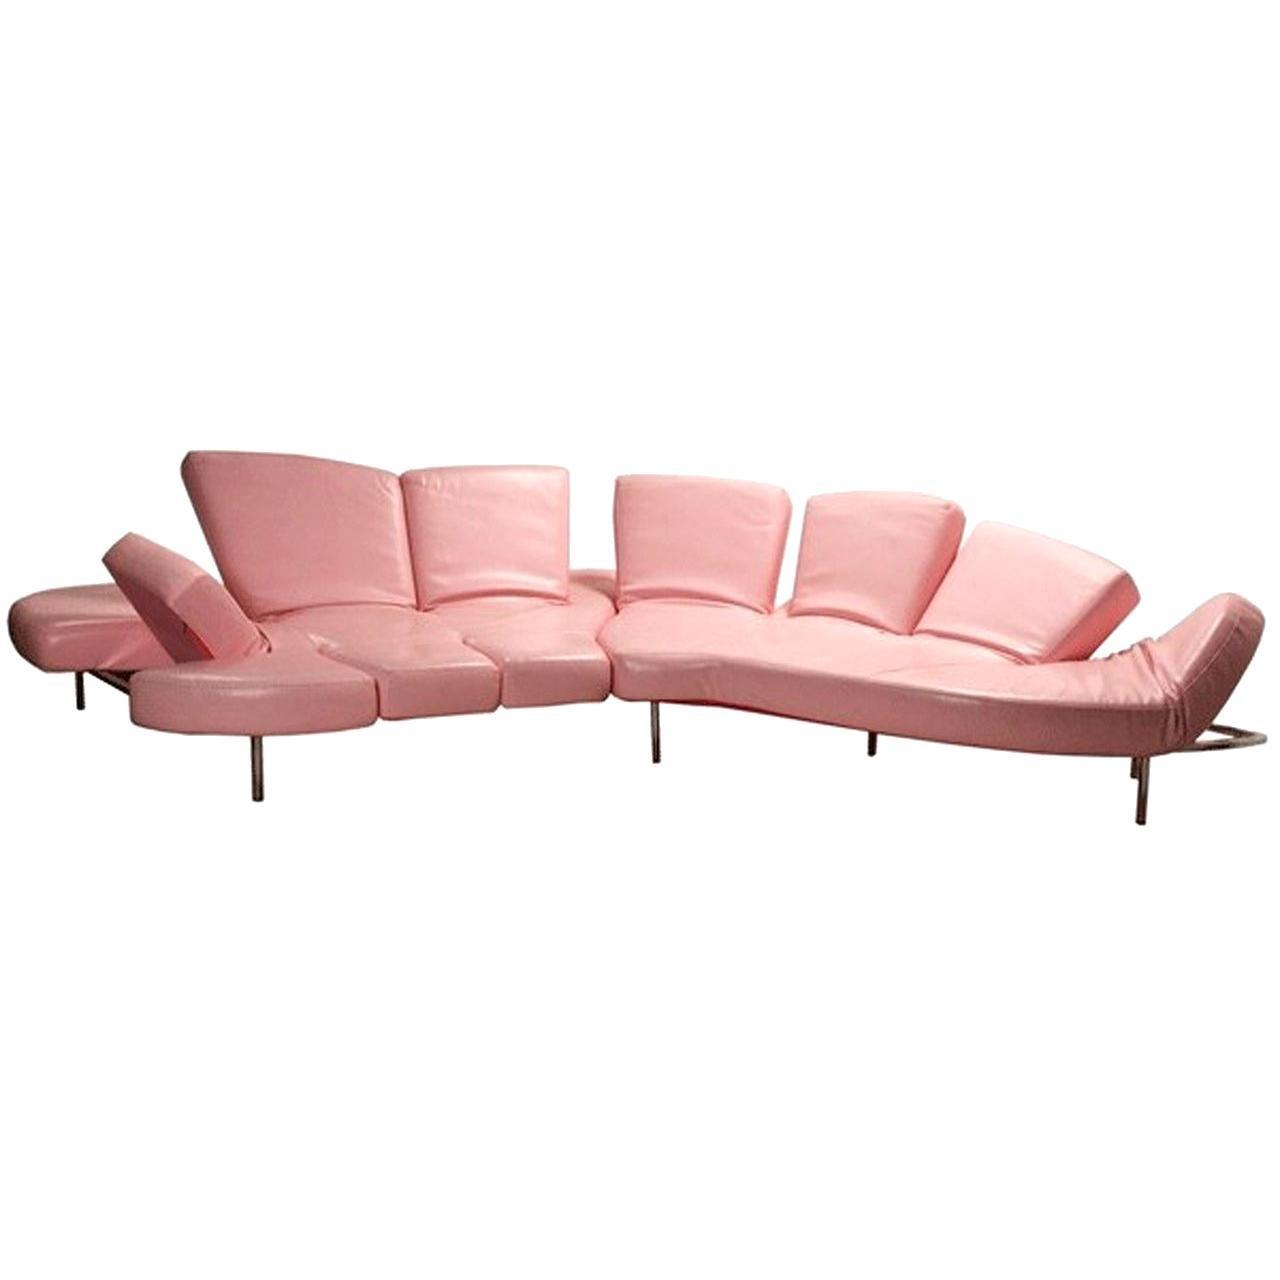 """Flap"" Sofa by Francesco Binfare for Edra, Italy"